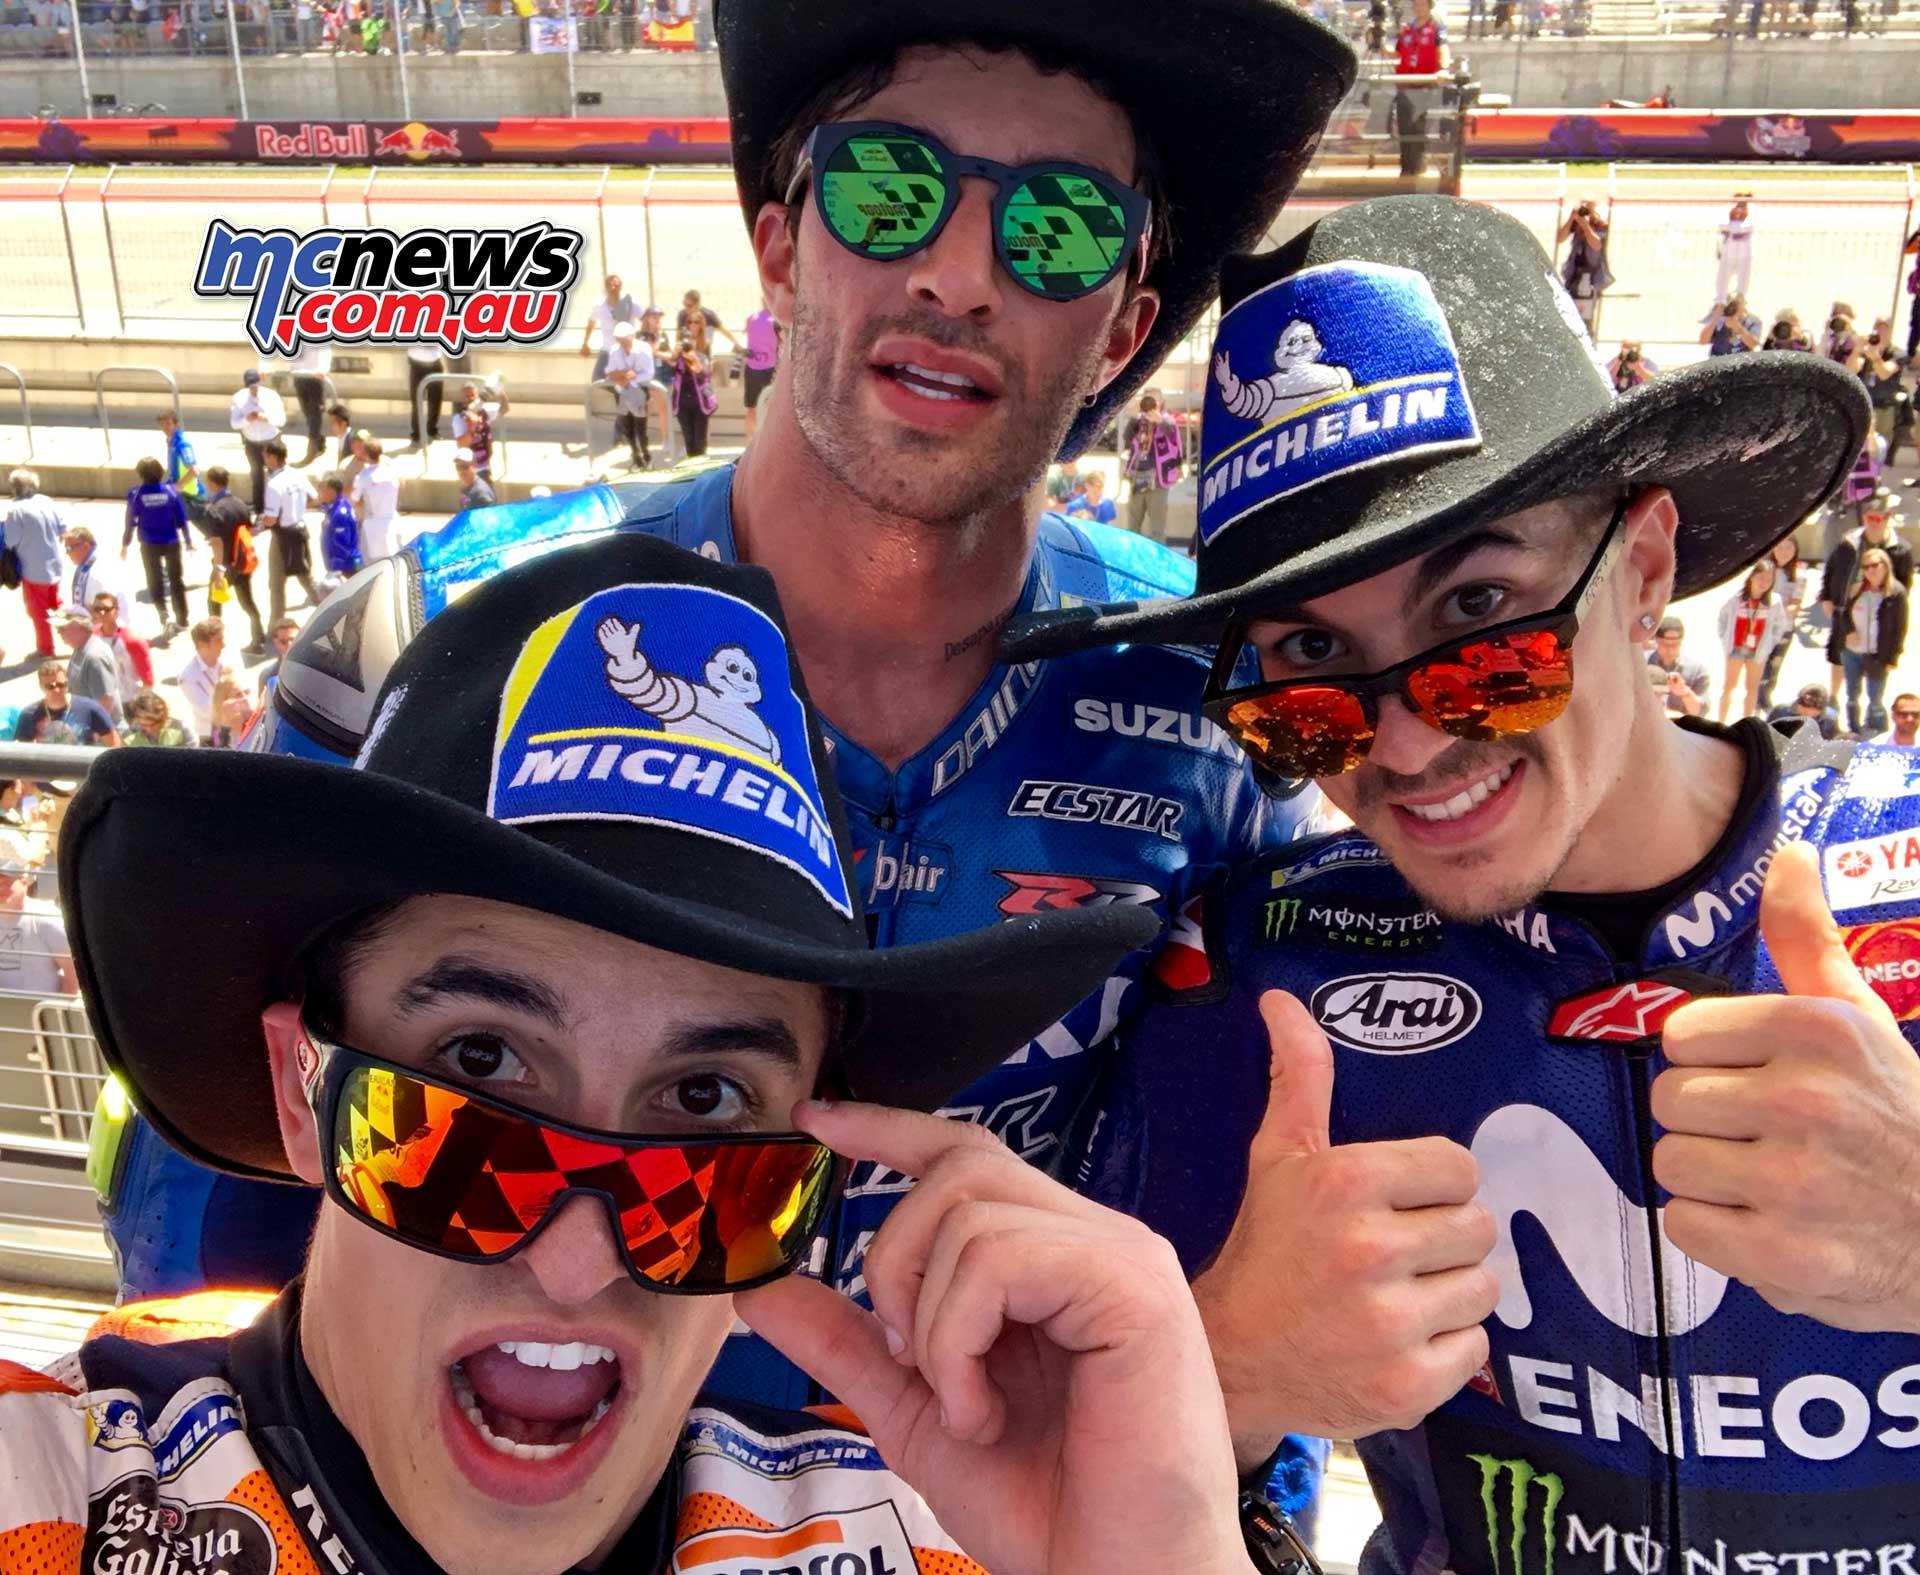 MotoGP: Marquez won the home race in Spain